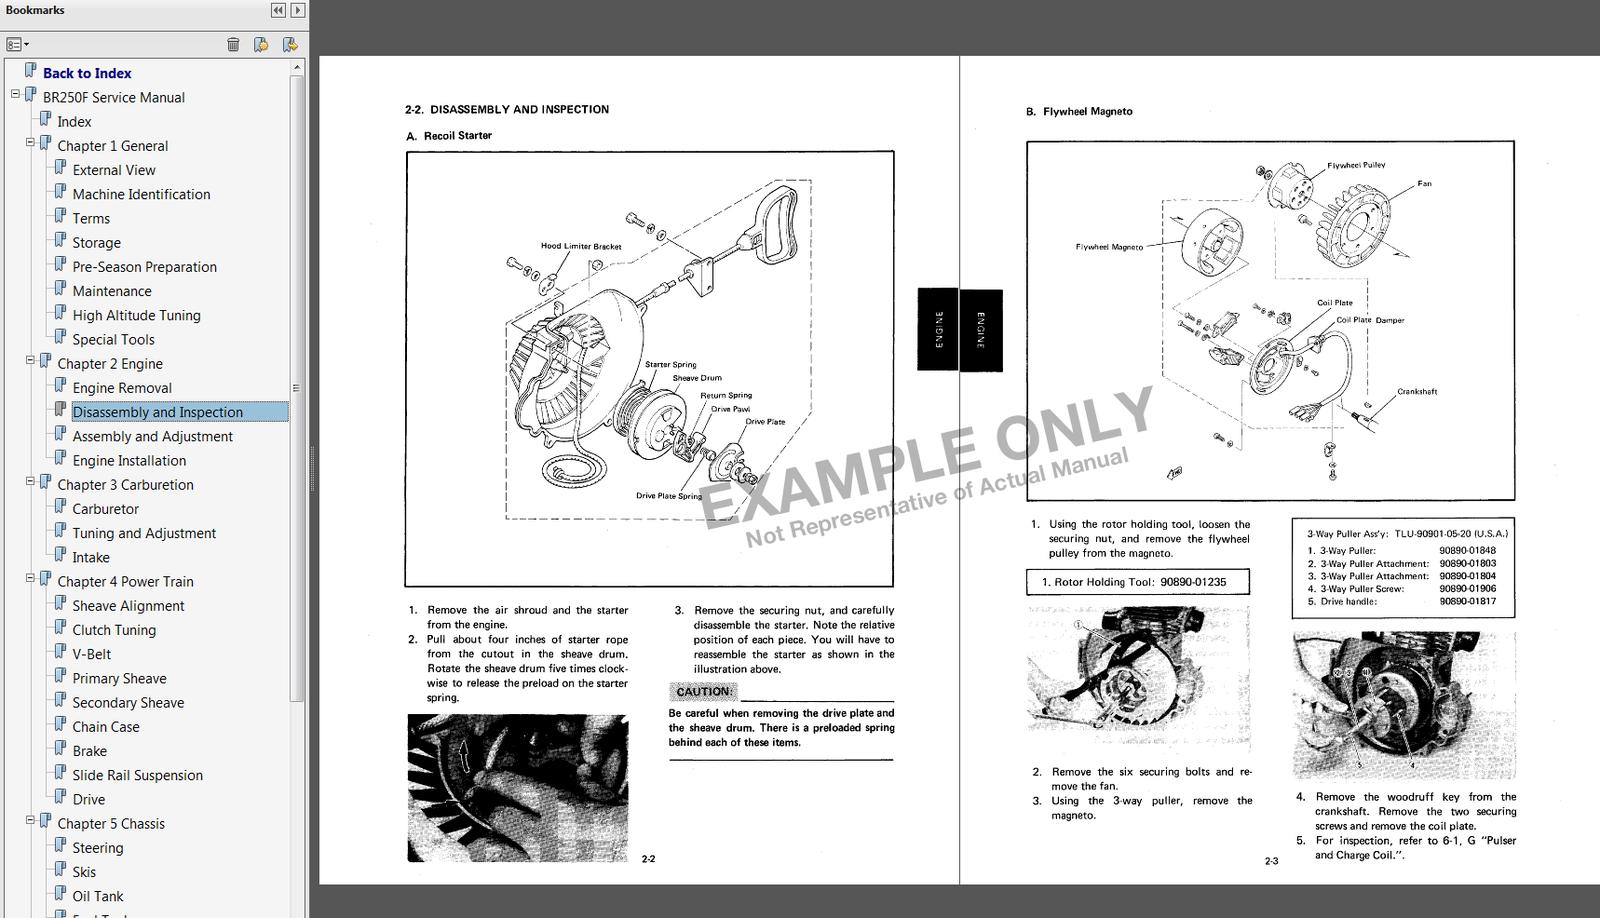 Samplewm. Samplewm. 1992-1999 Yamaha Ovation LE Snowmobile Service Manual  ...